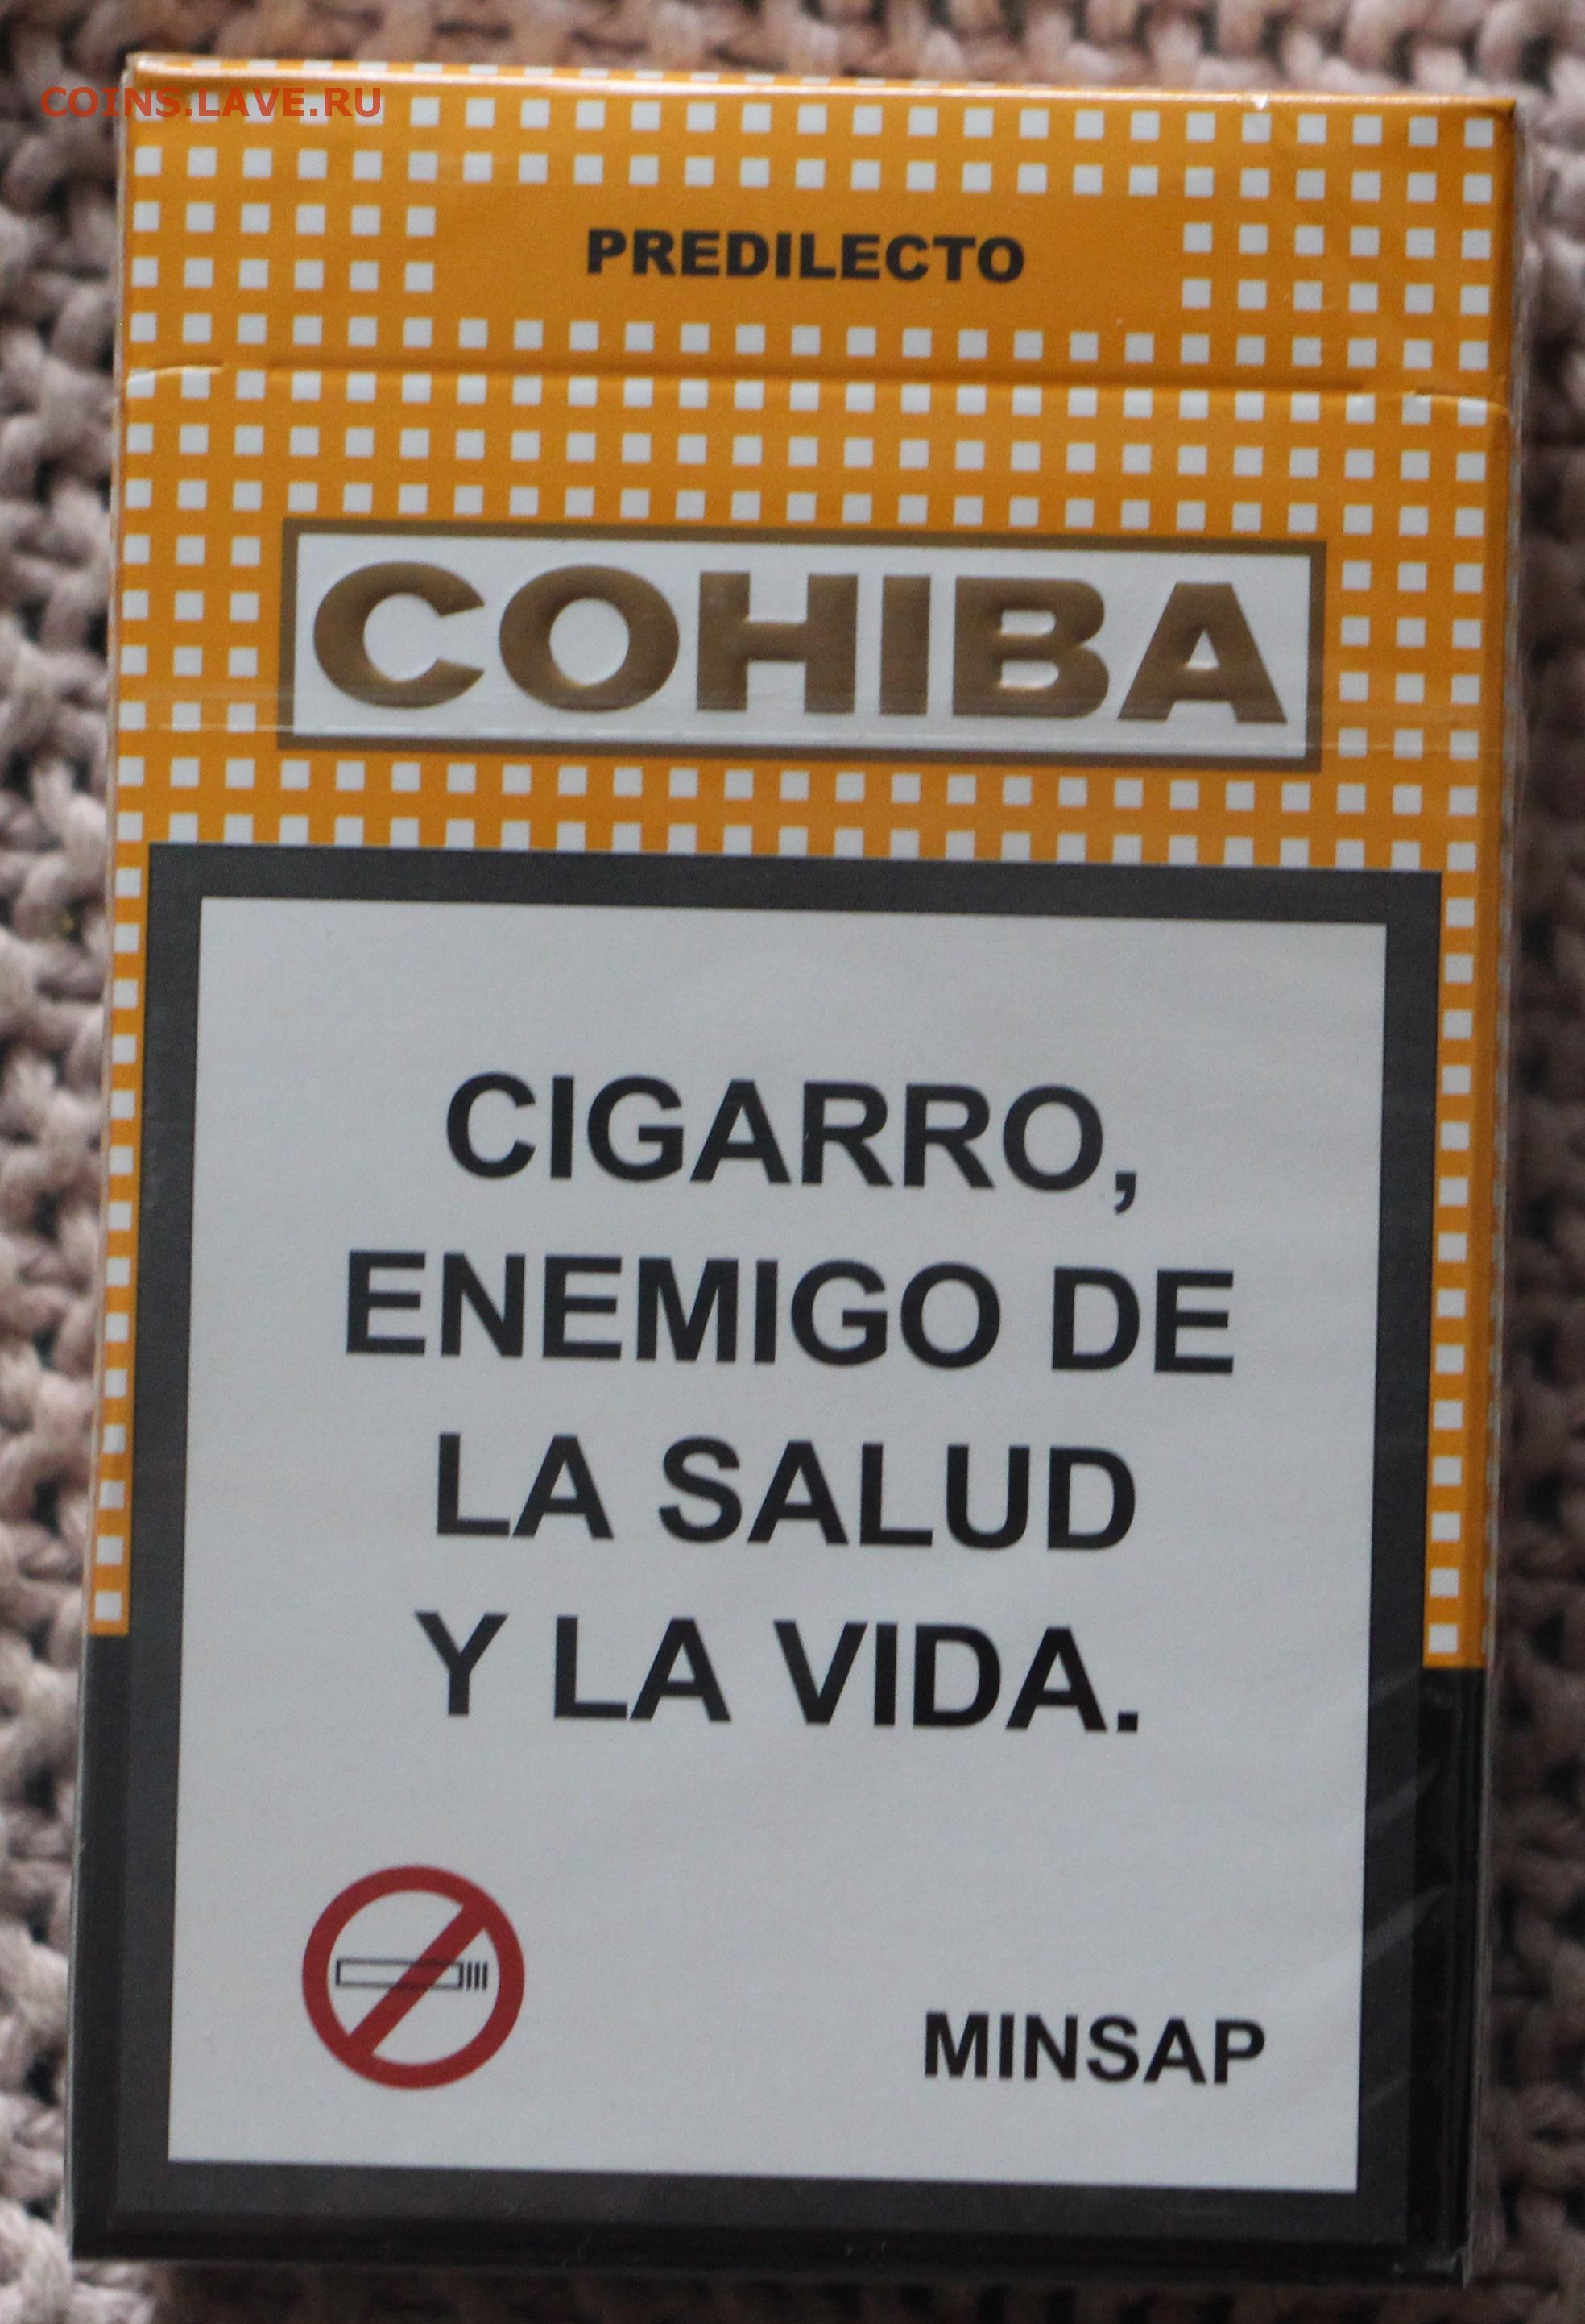 сигареты cohiba predilecto купить